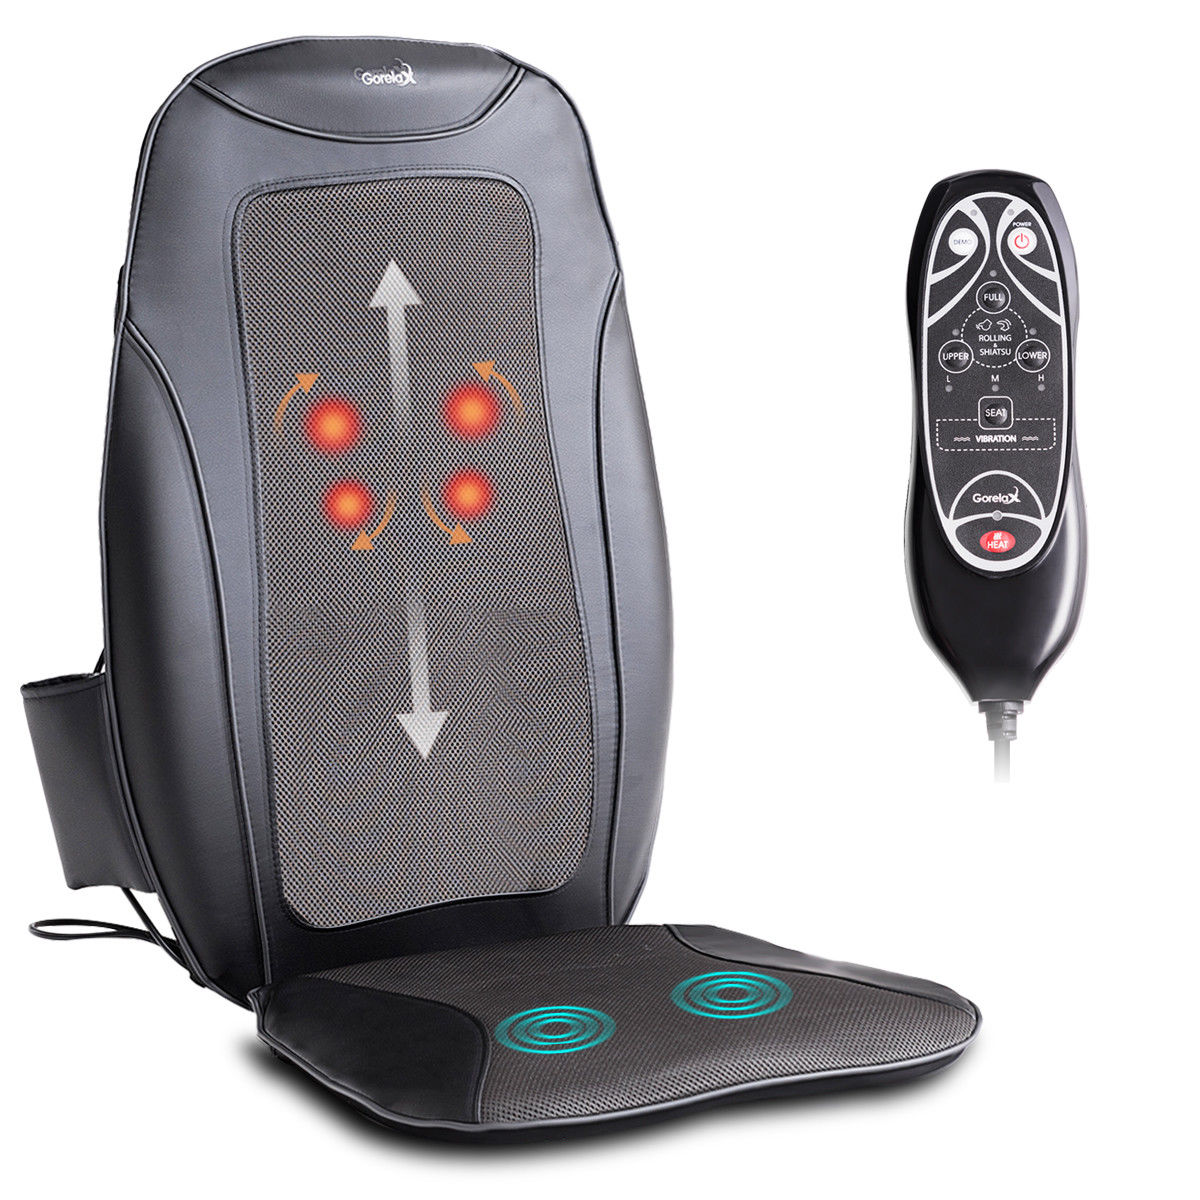 Gymax Shiatsu Massage Cushion Massager Chair Seat Vibration Rolling Heating Home Car